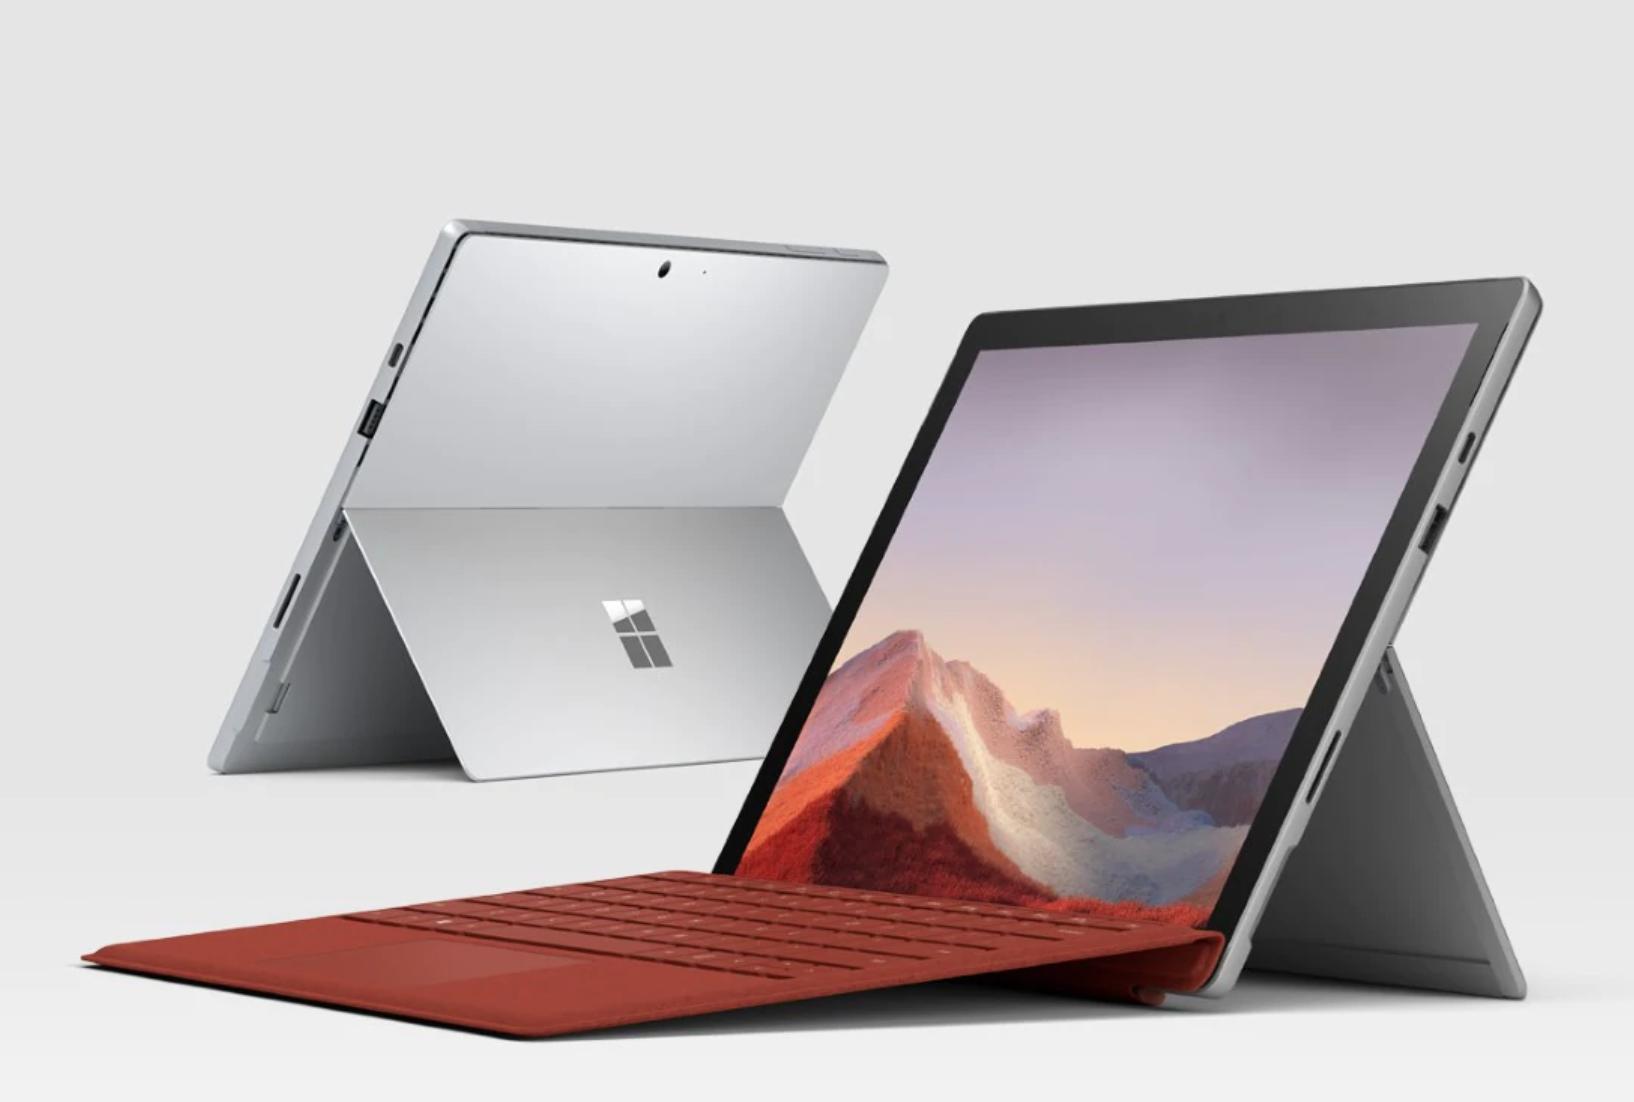 Microsoft Surface Pro 3 i7 128Gb